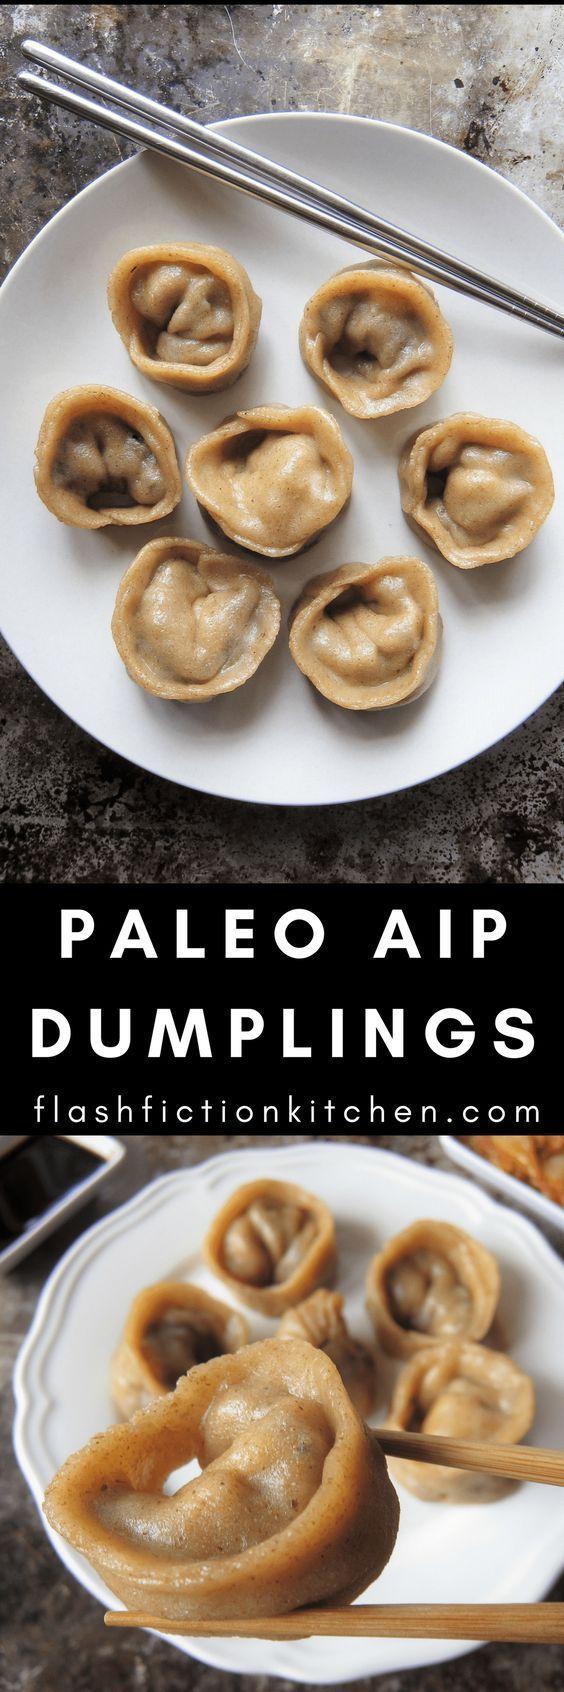 Tigernut flour /// Paleo AIP dumplings from Flash Fiction Kitchen